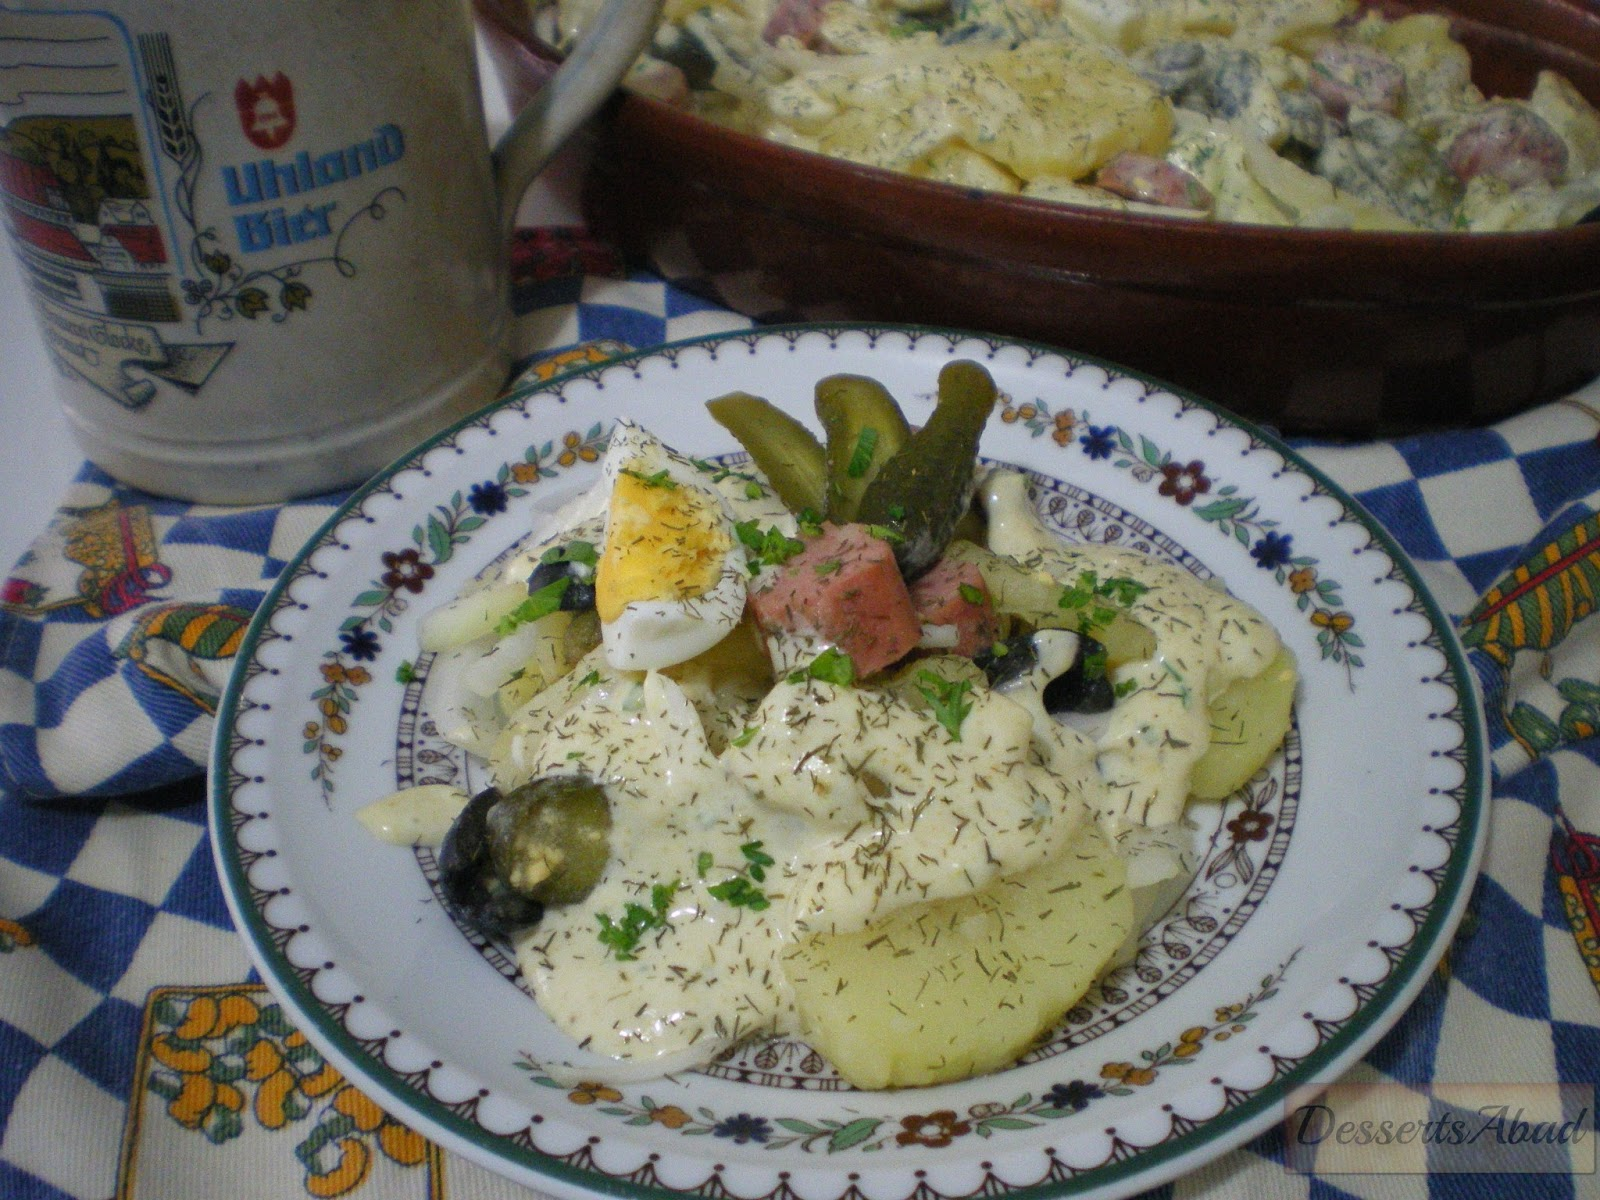 Dessertsabad kartoffelsalat ensalada de patatas - Ensalada alemana de patatas ...